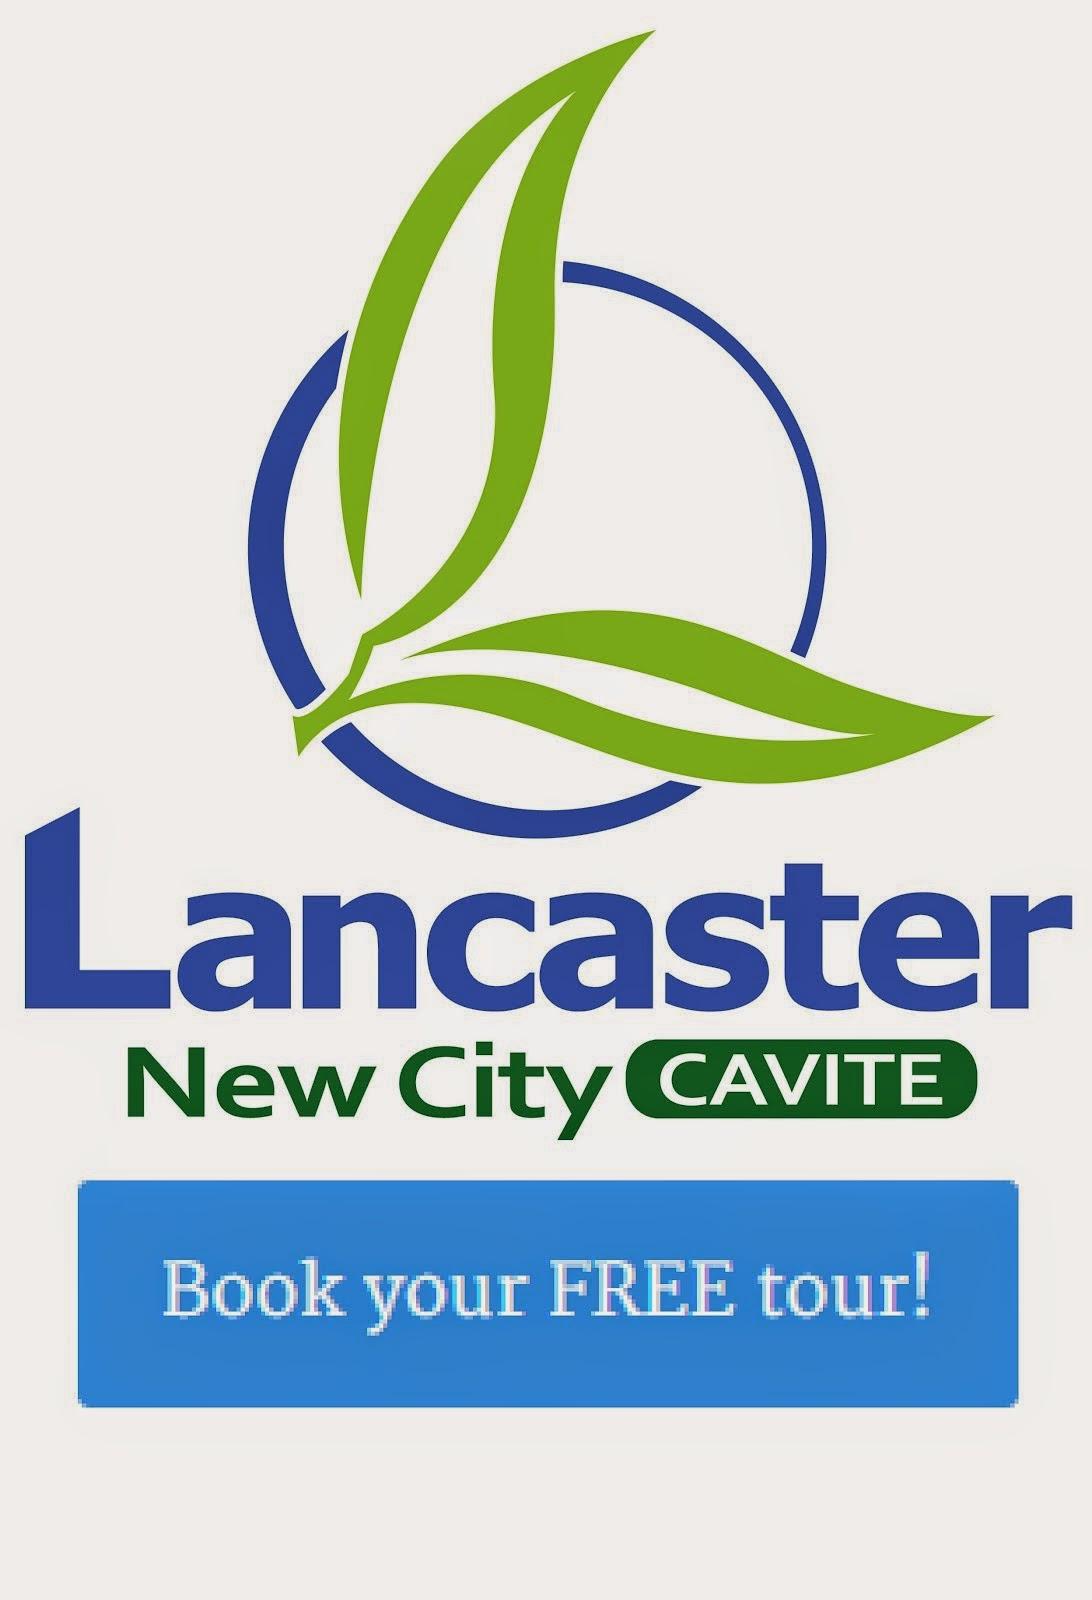 #LancasterNewCity